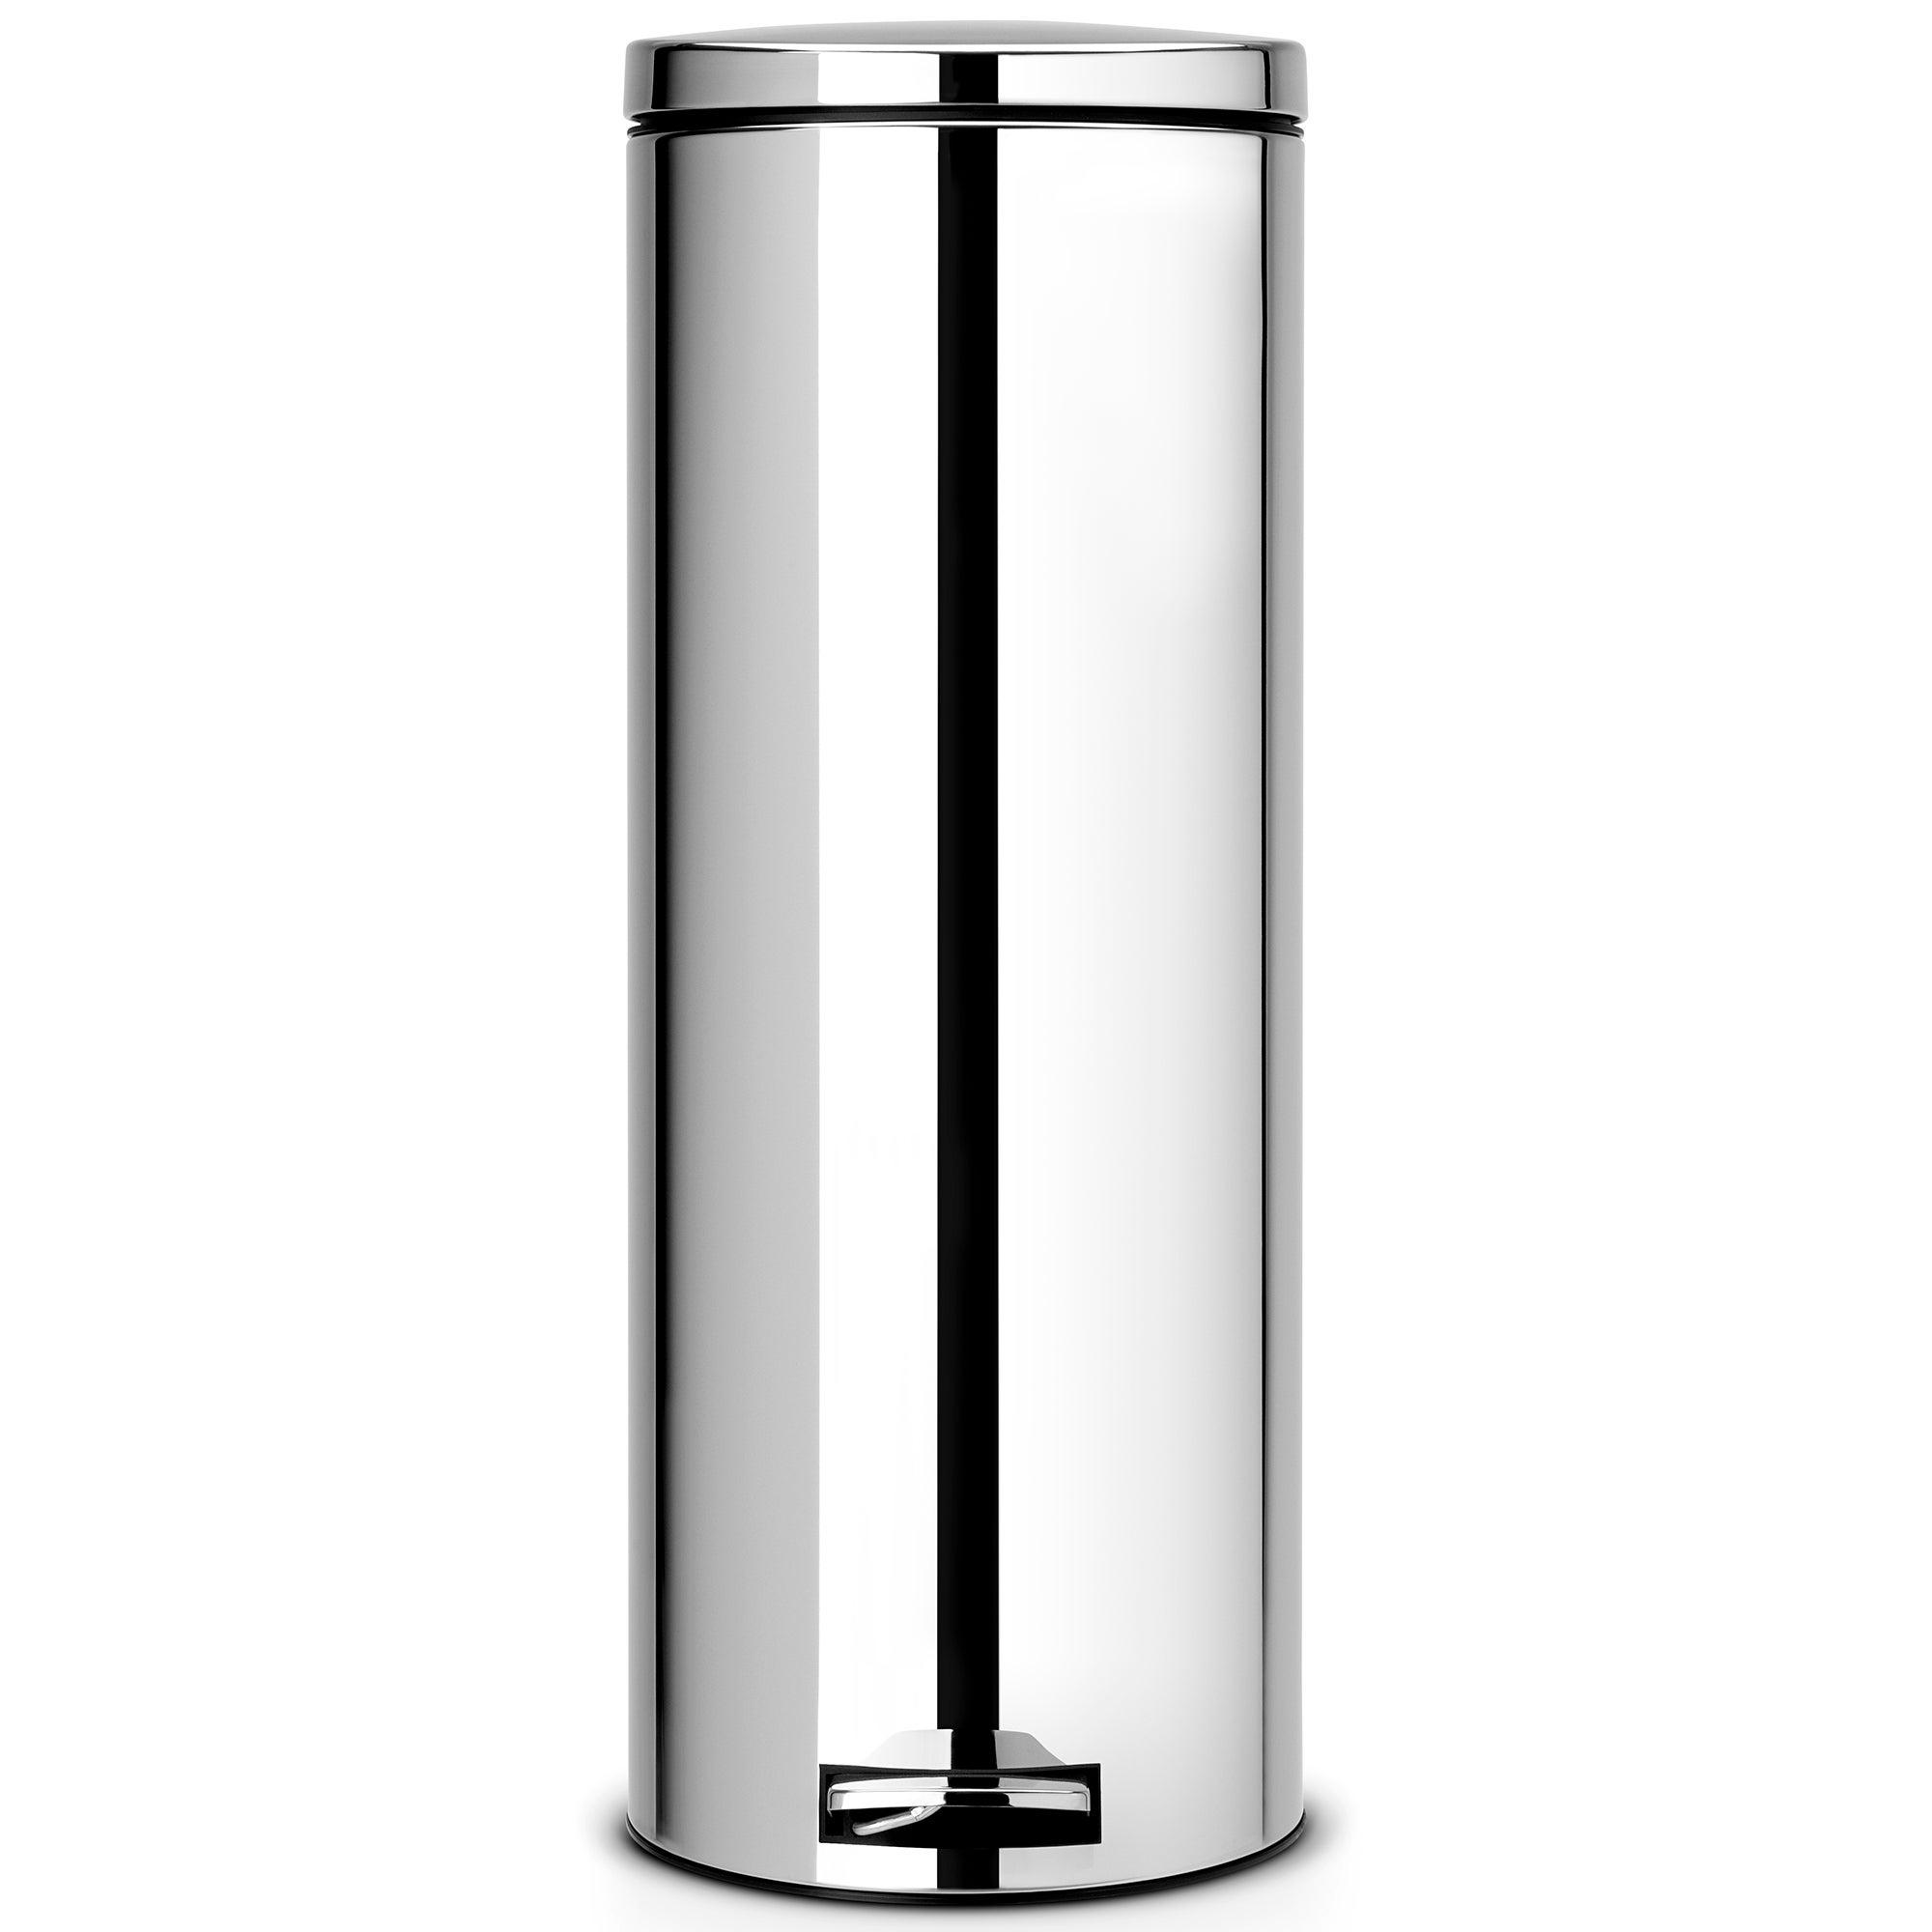 Brabantia brilliant steel 20 litre slim pedal bin silver - Poubelle brabantia 20 litres ...